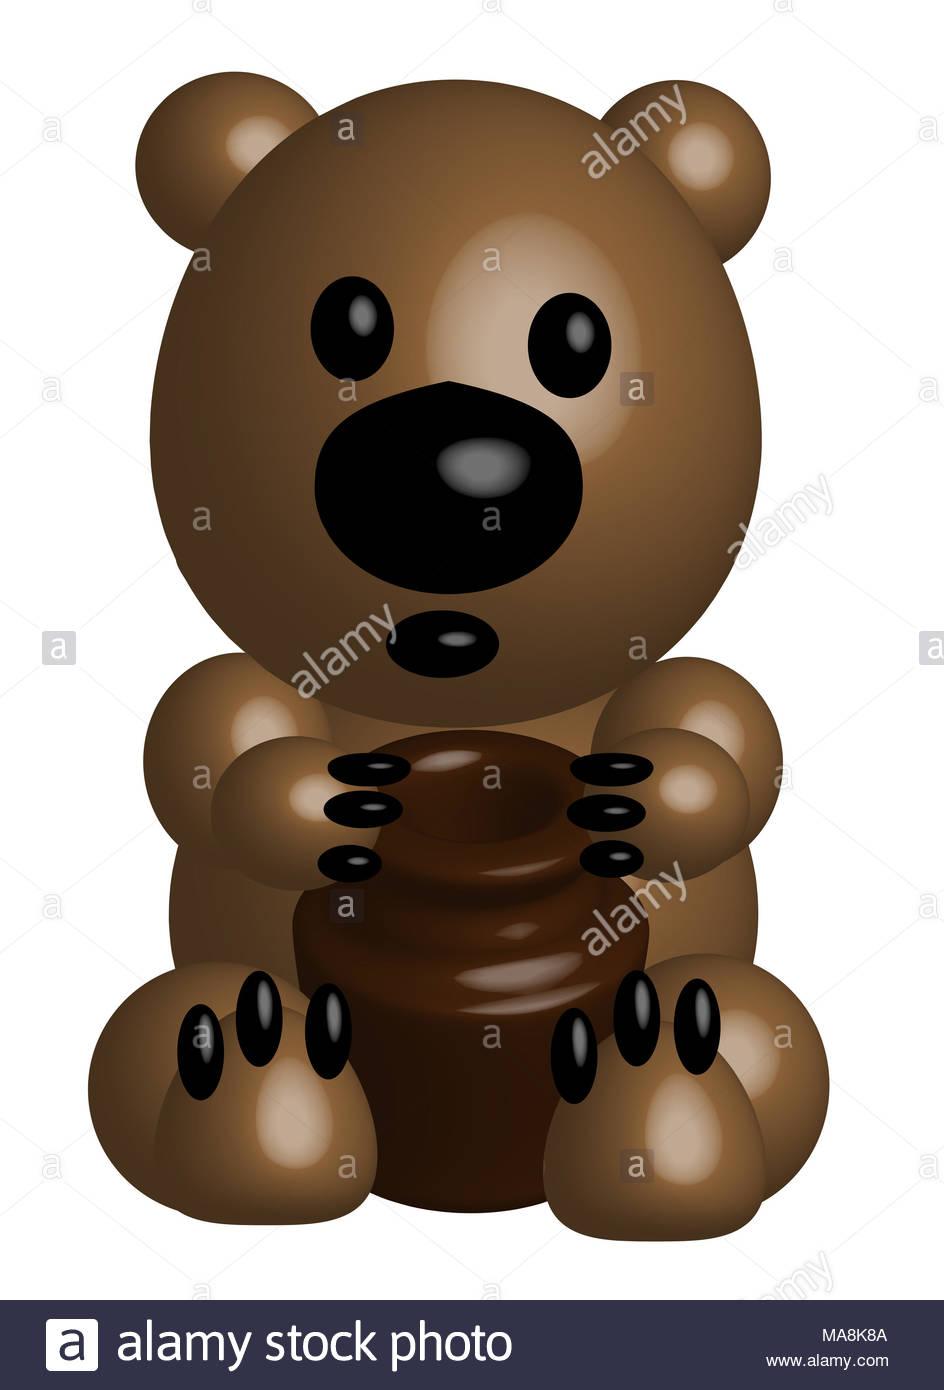 Cartoon Jar Honey Stock Photos Images Alamy Mps Whitehoney Bear With A Pot Of 3d Image